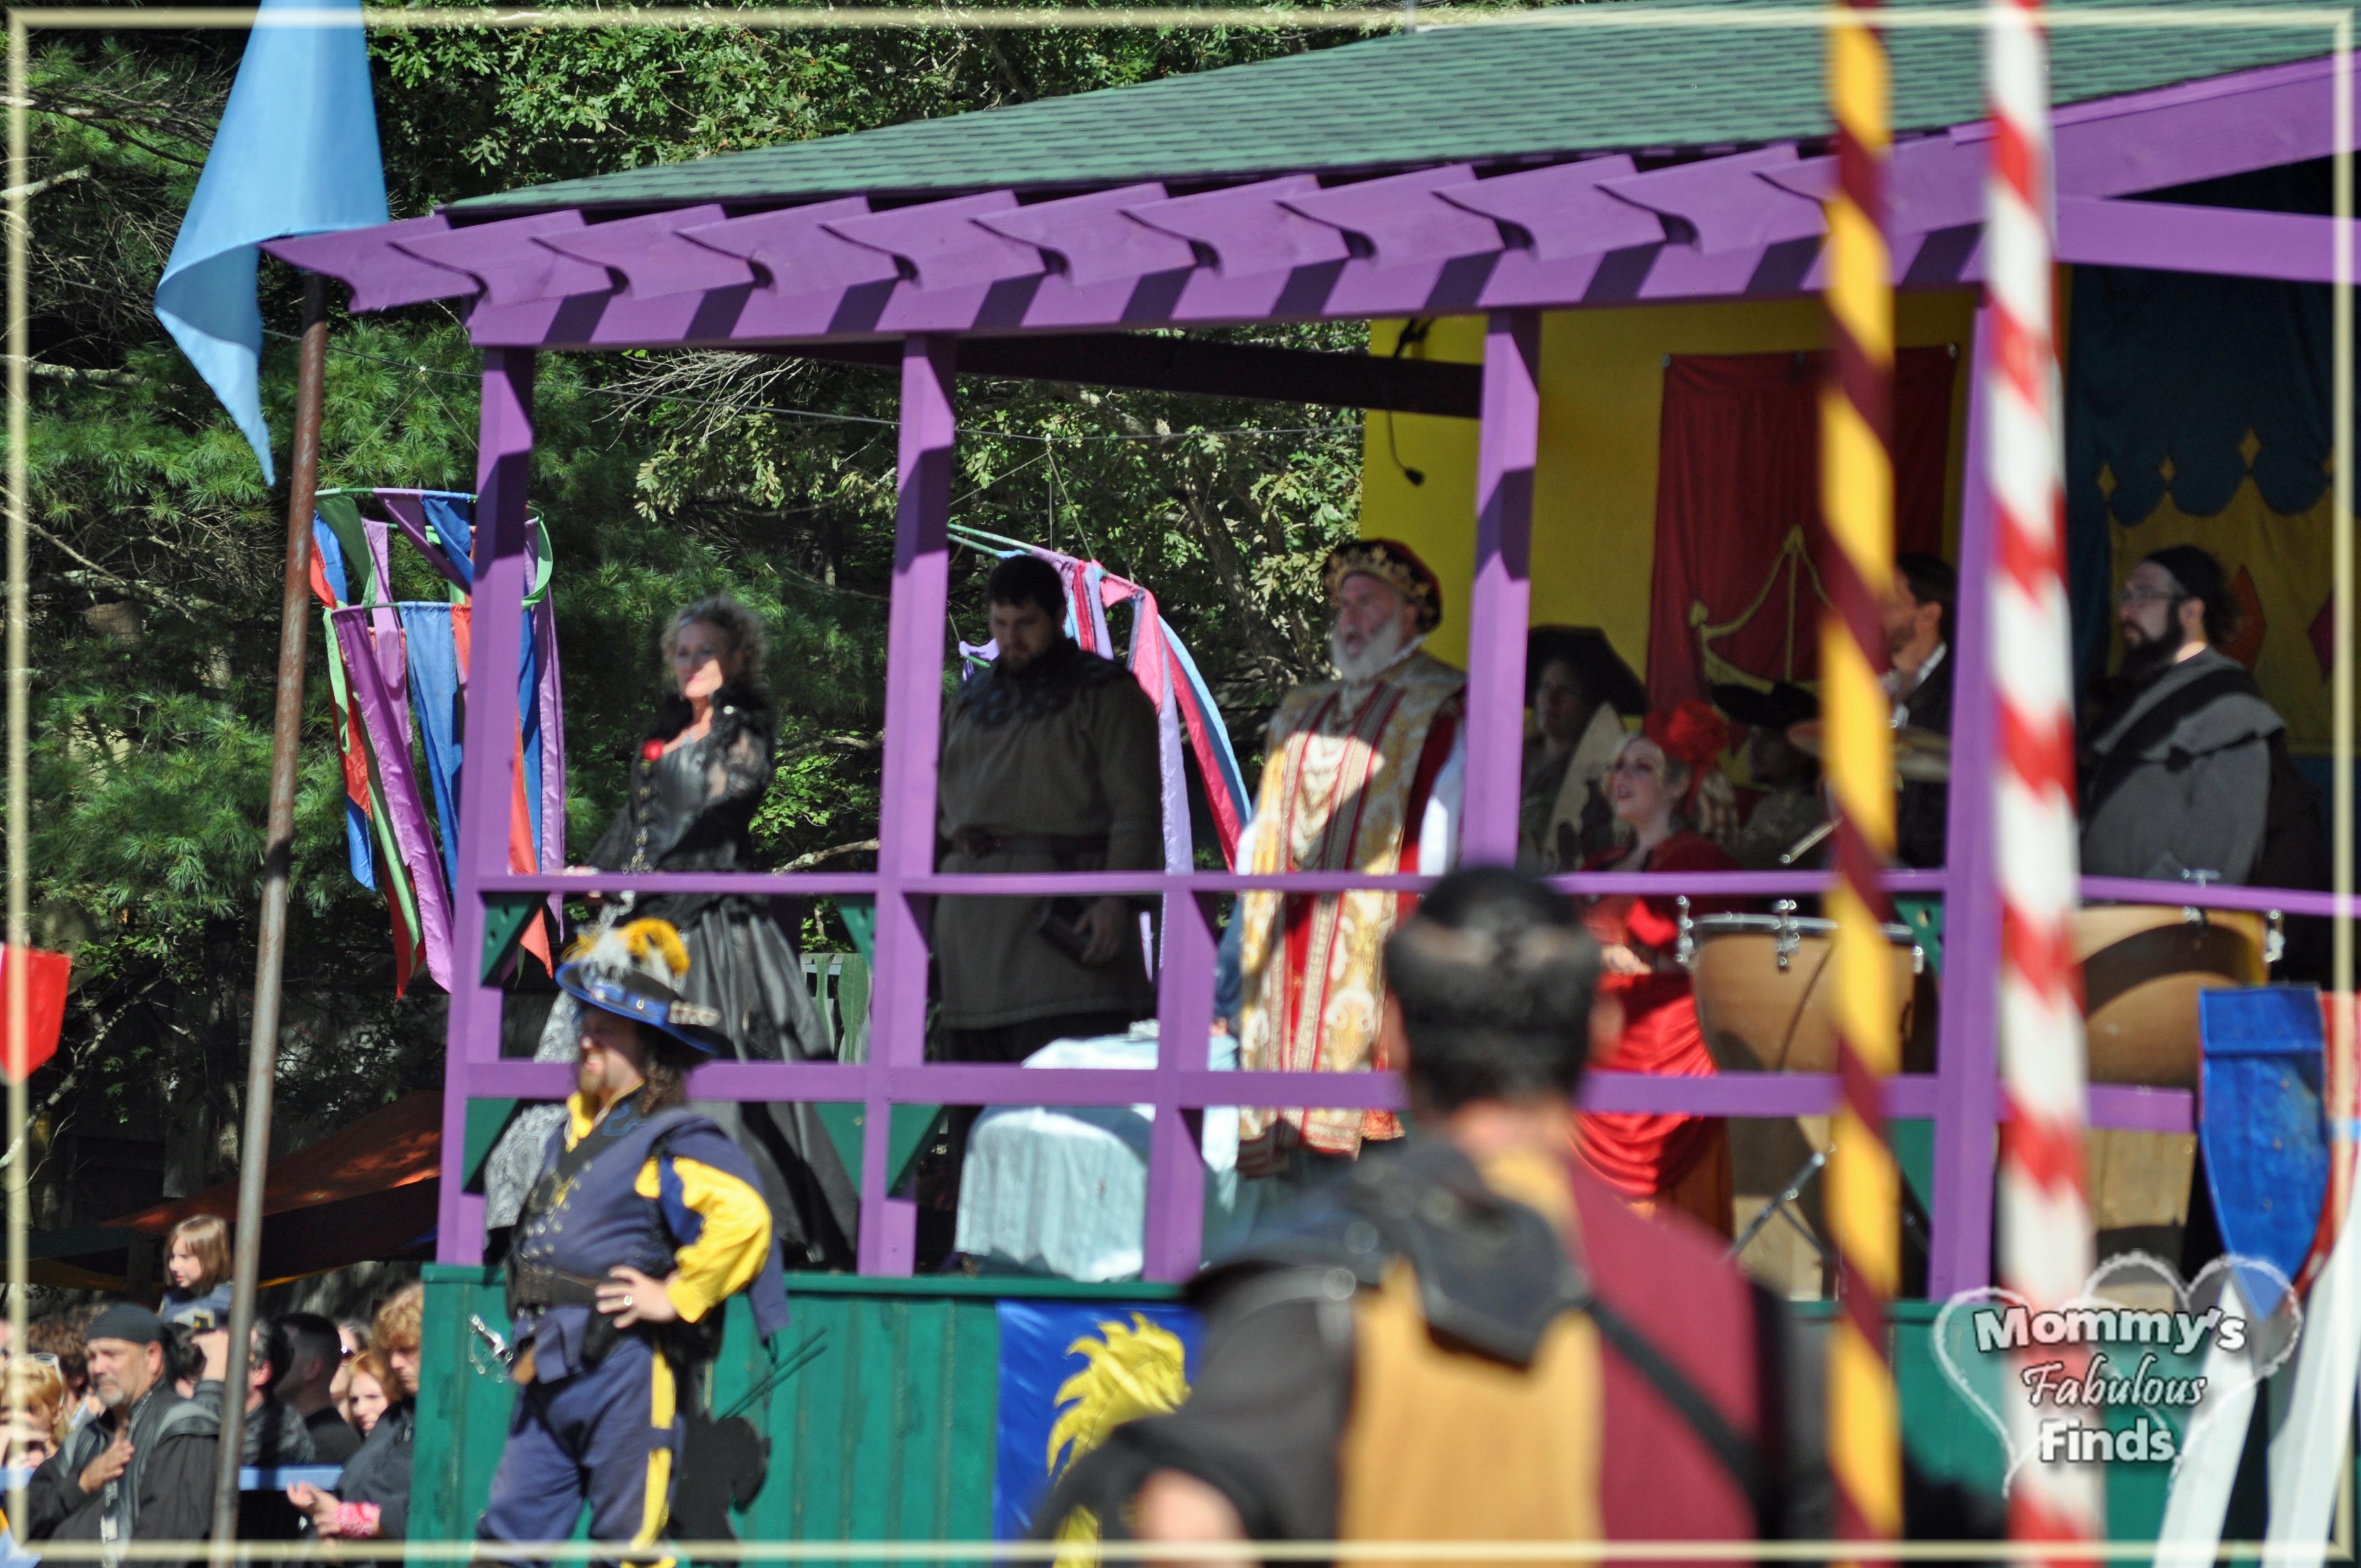 King Richard's Faire – Carver, MA